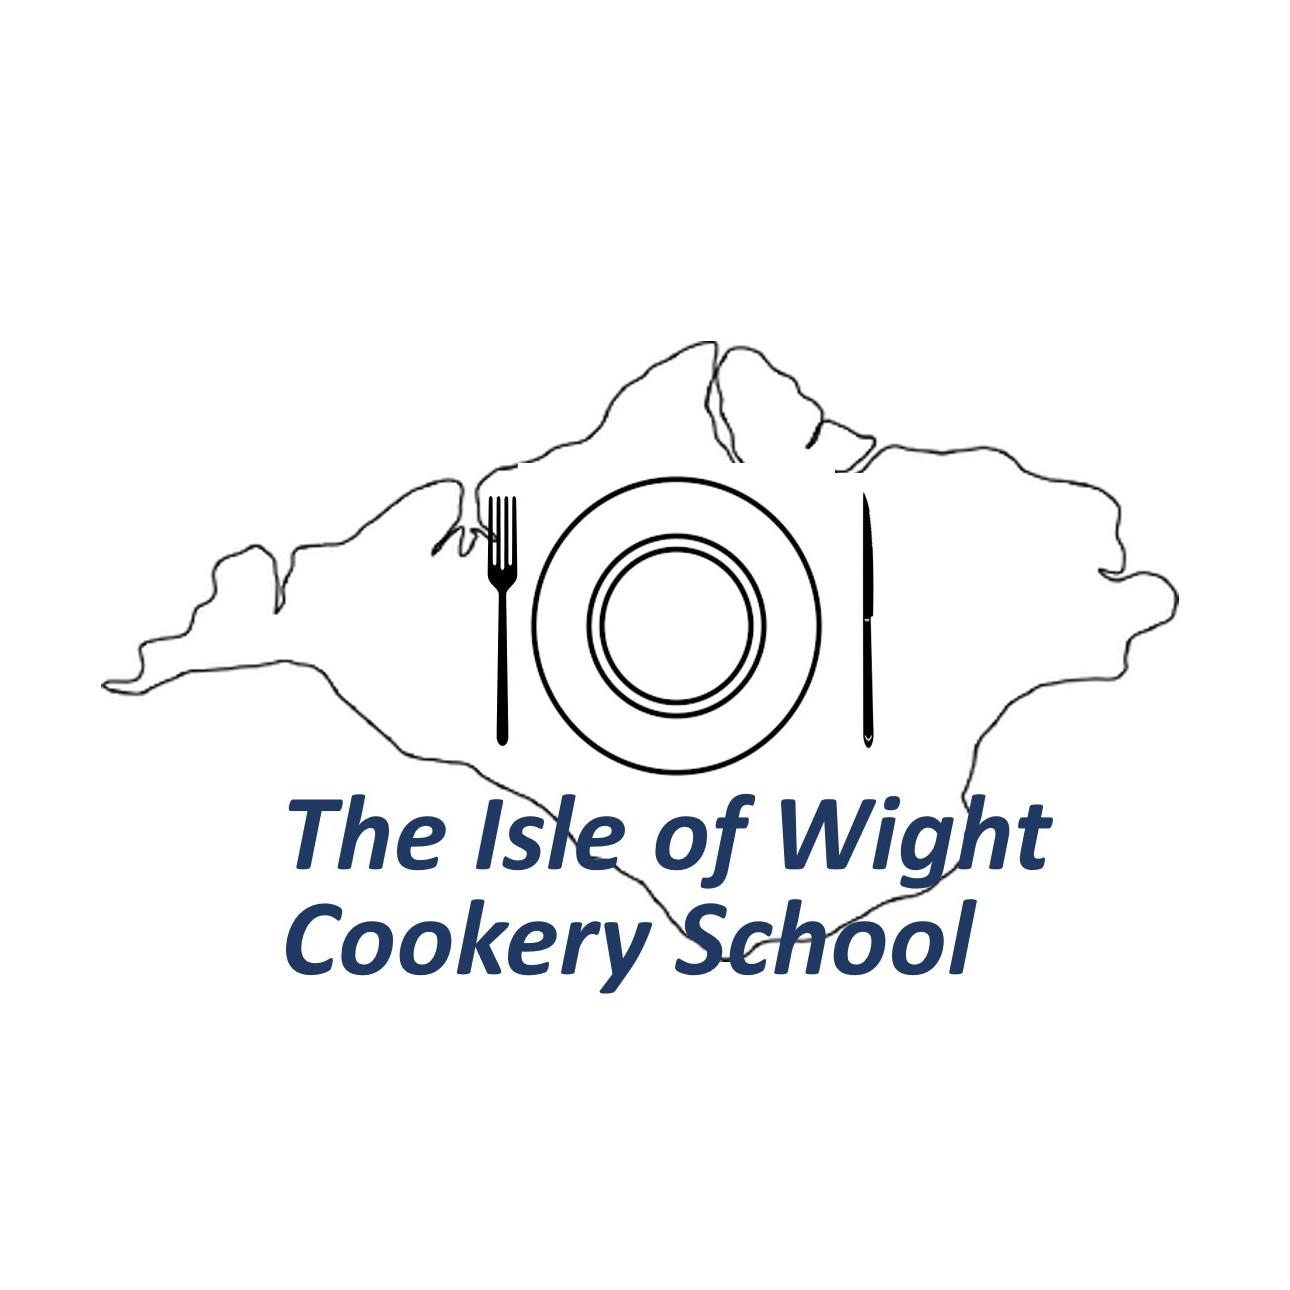 Isle of Wight Cookery School Logo